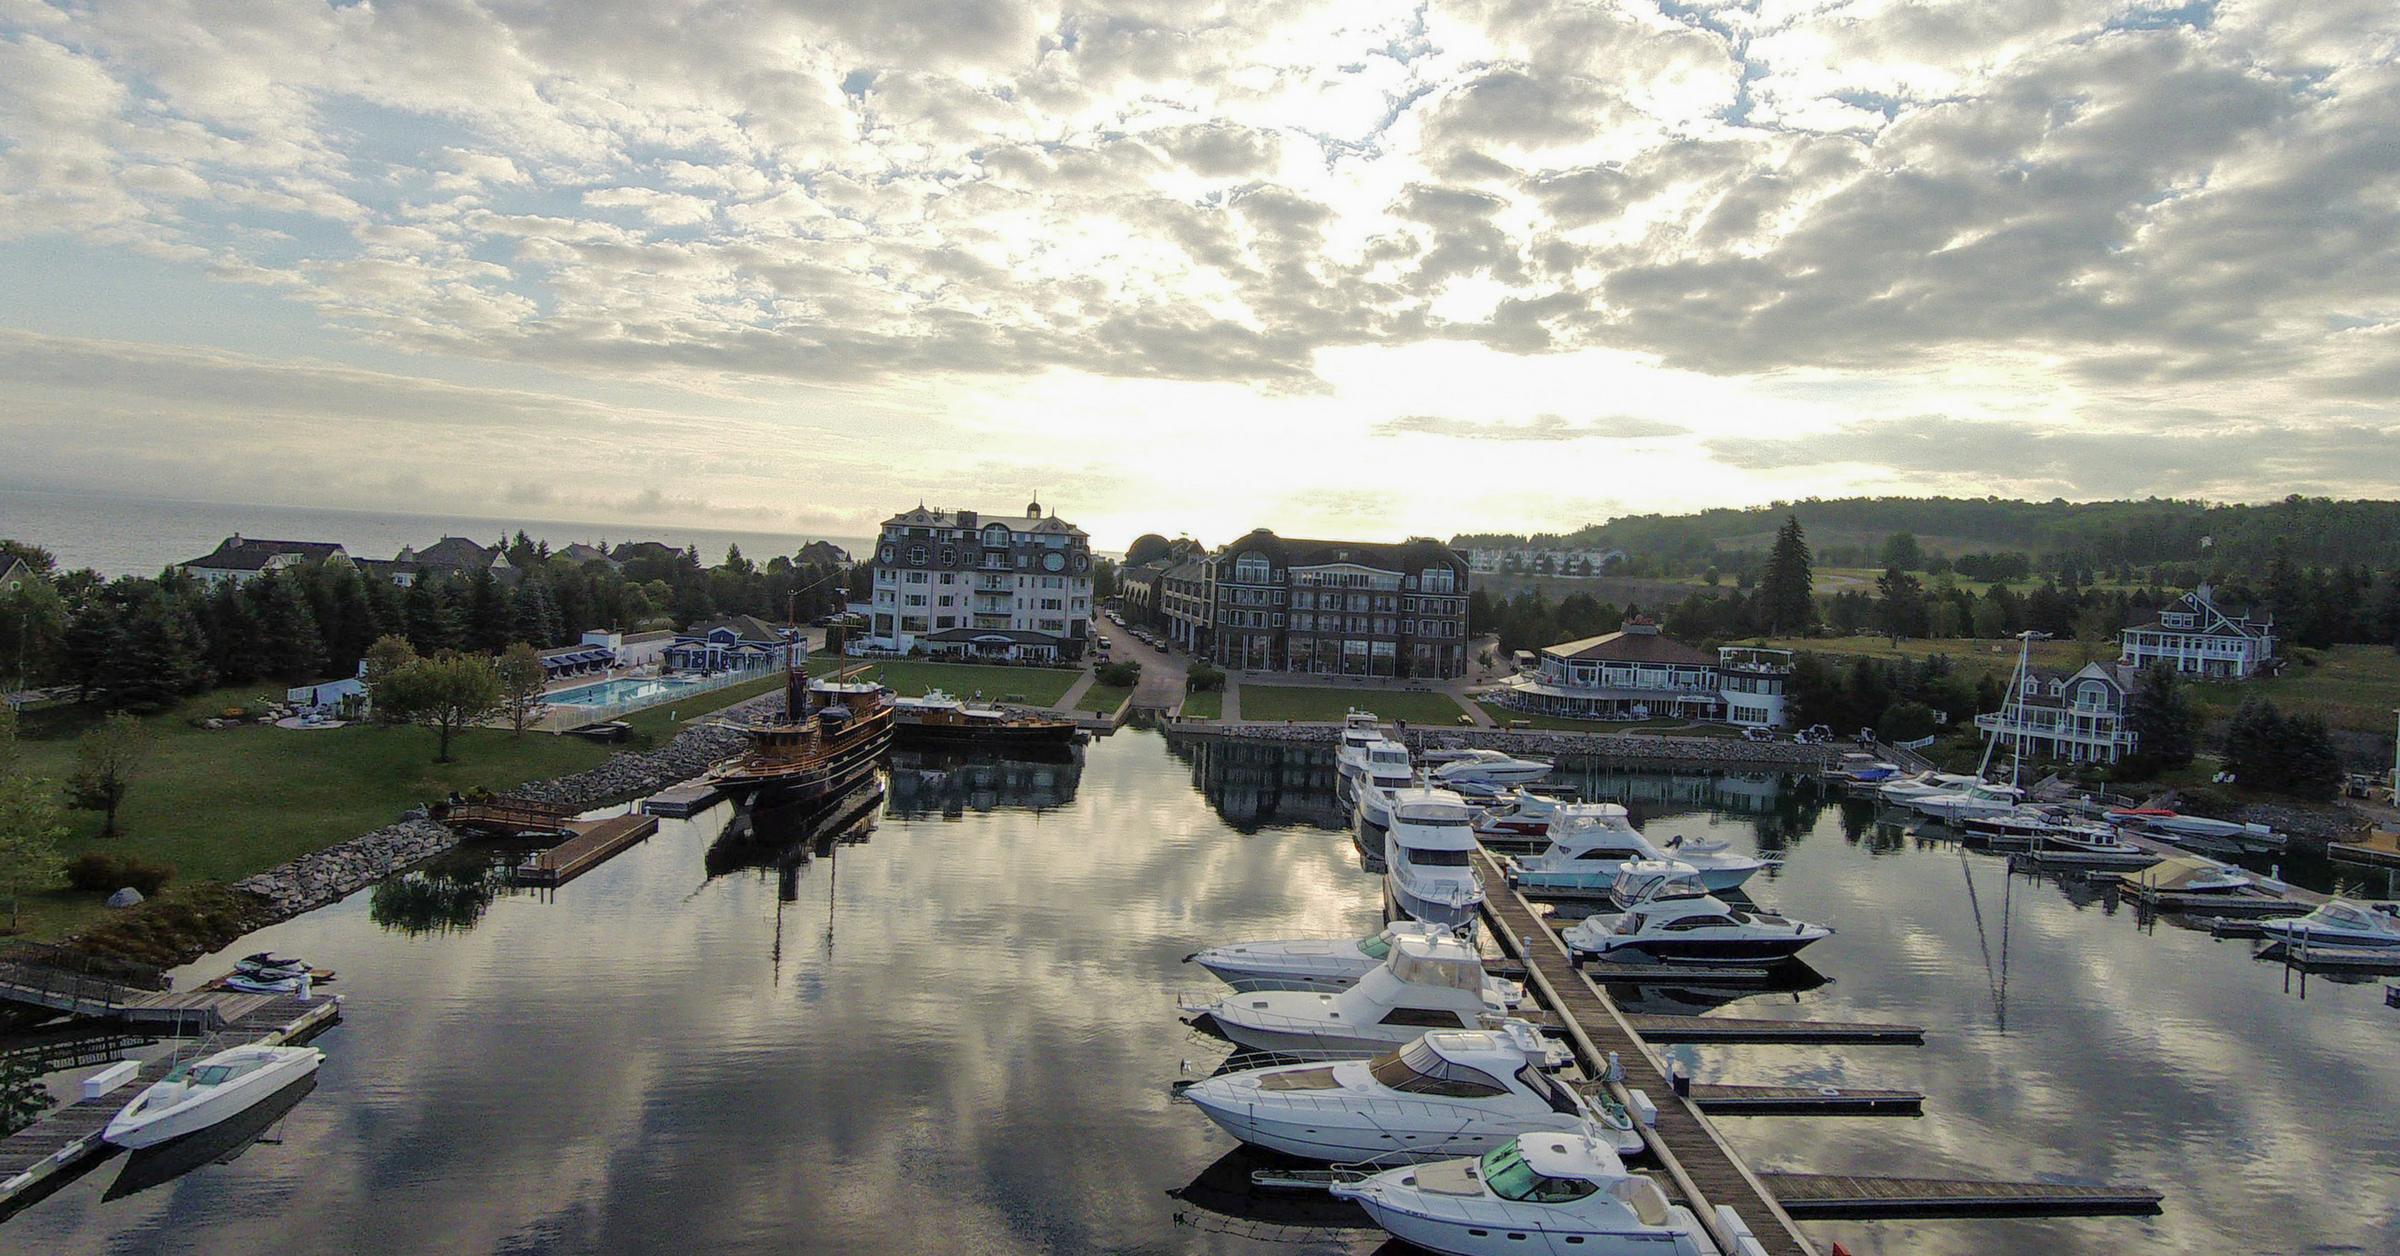 Bay Harbor Lake Marina: the Nautical Center of the Great Lakes